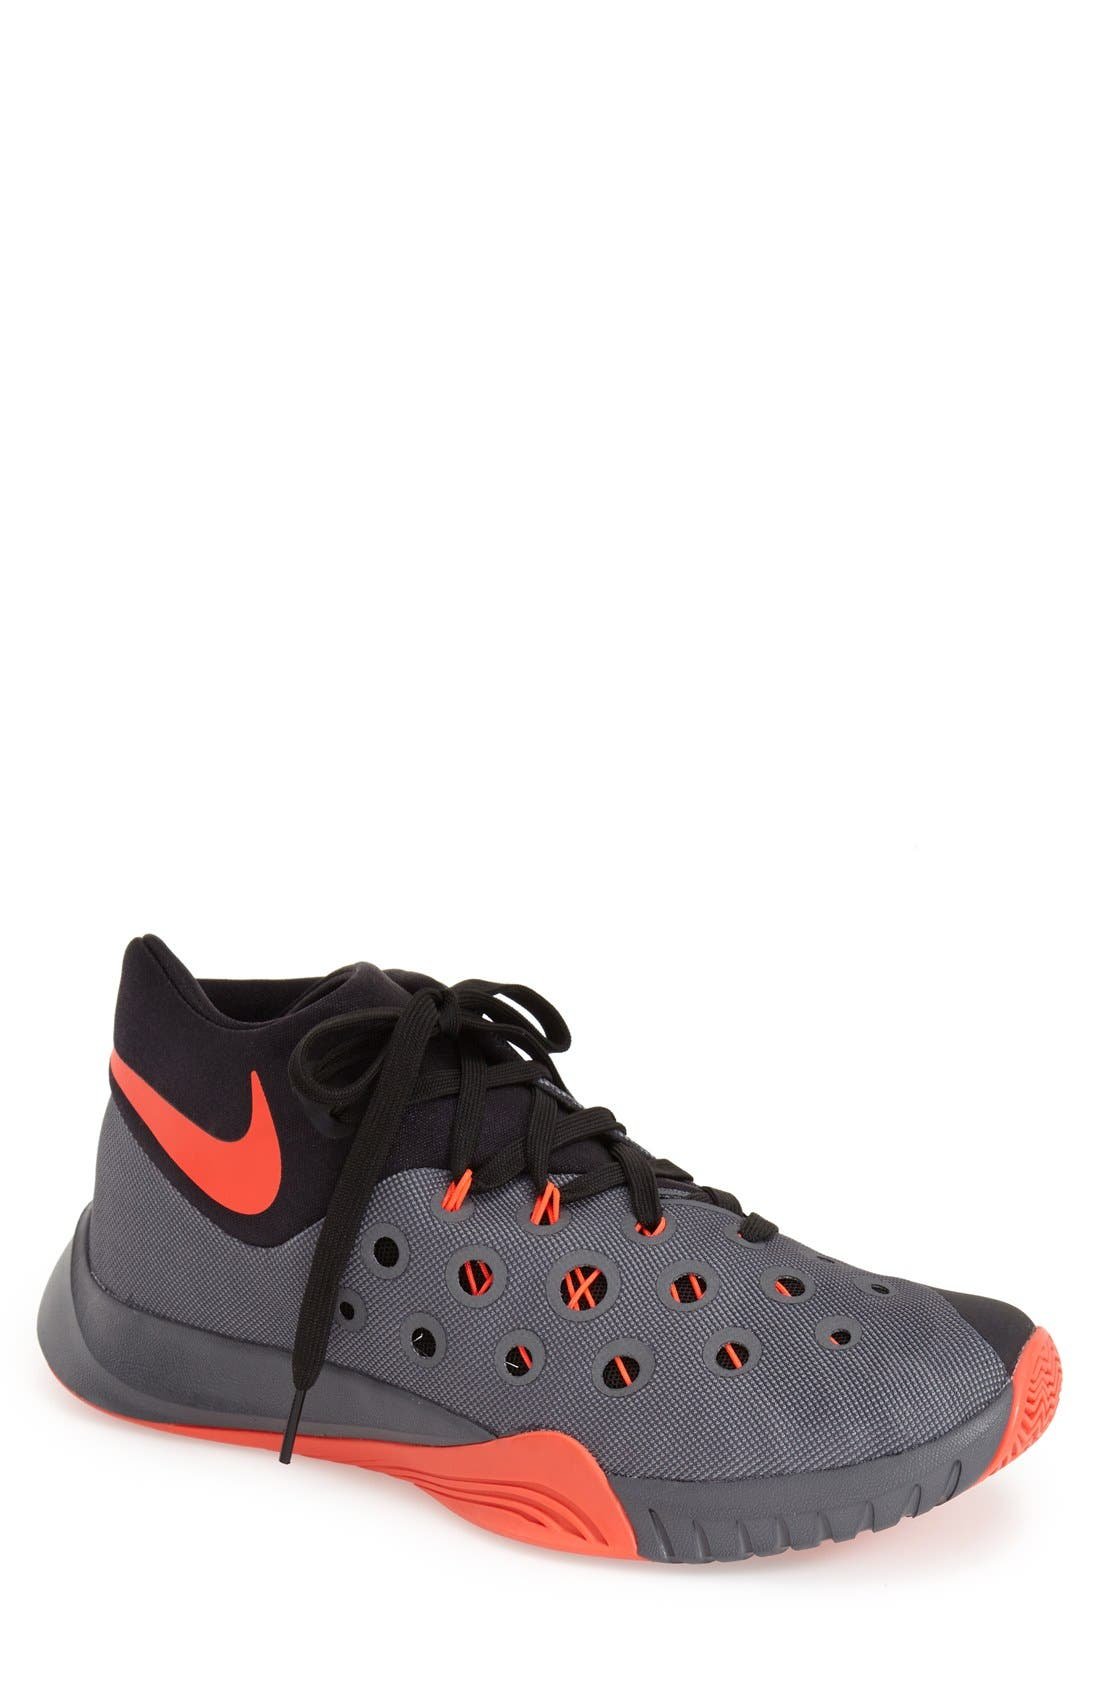 Main Image - Nike 'Zoom Hyperquickness 2015' Basketball Shoe (Men)